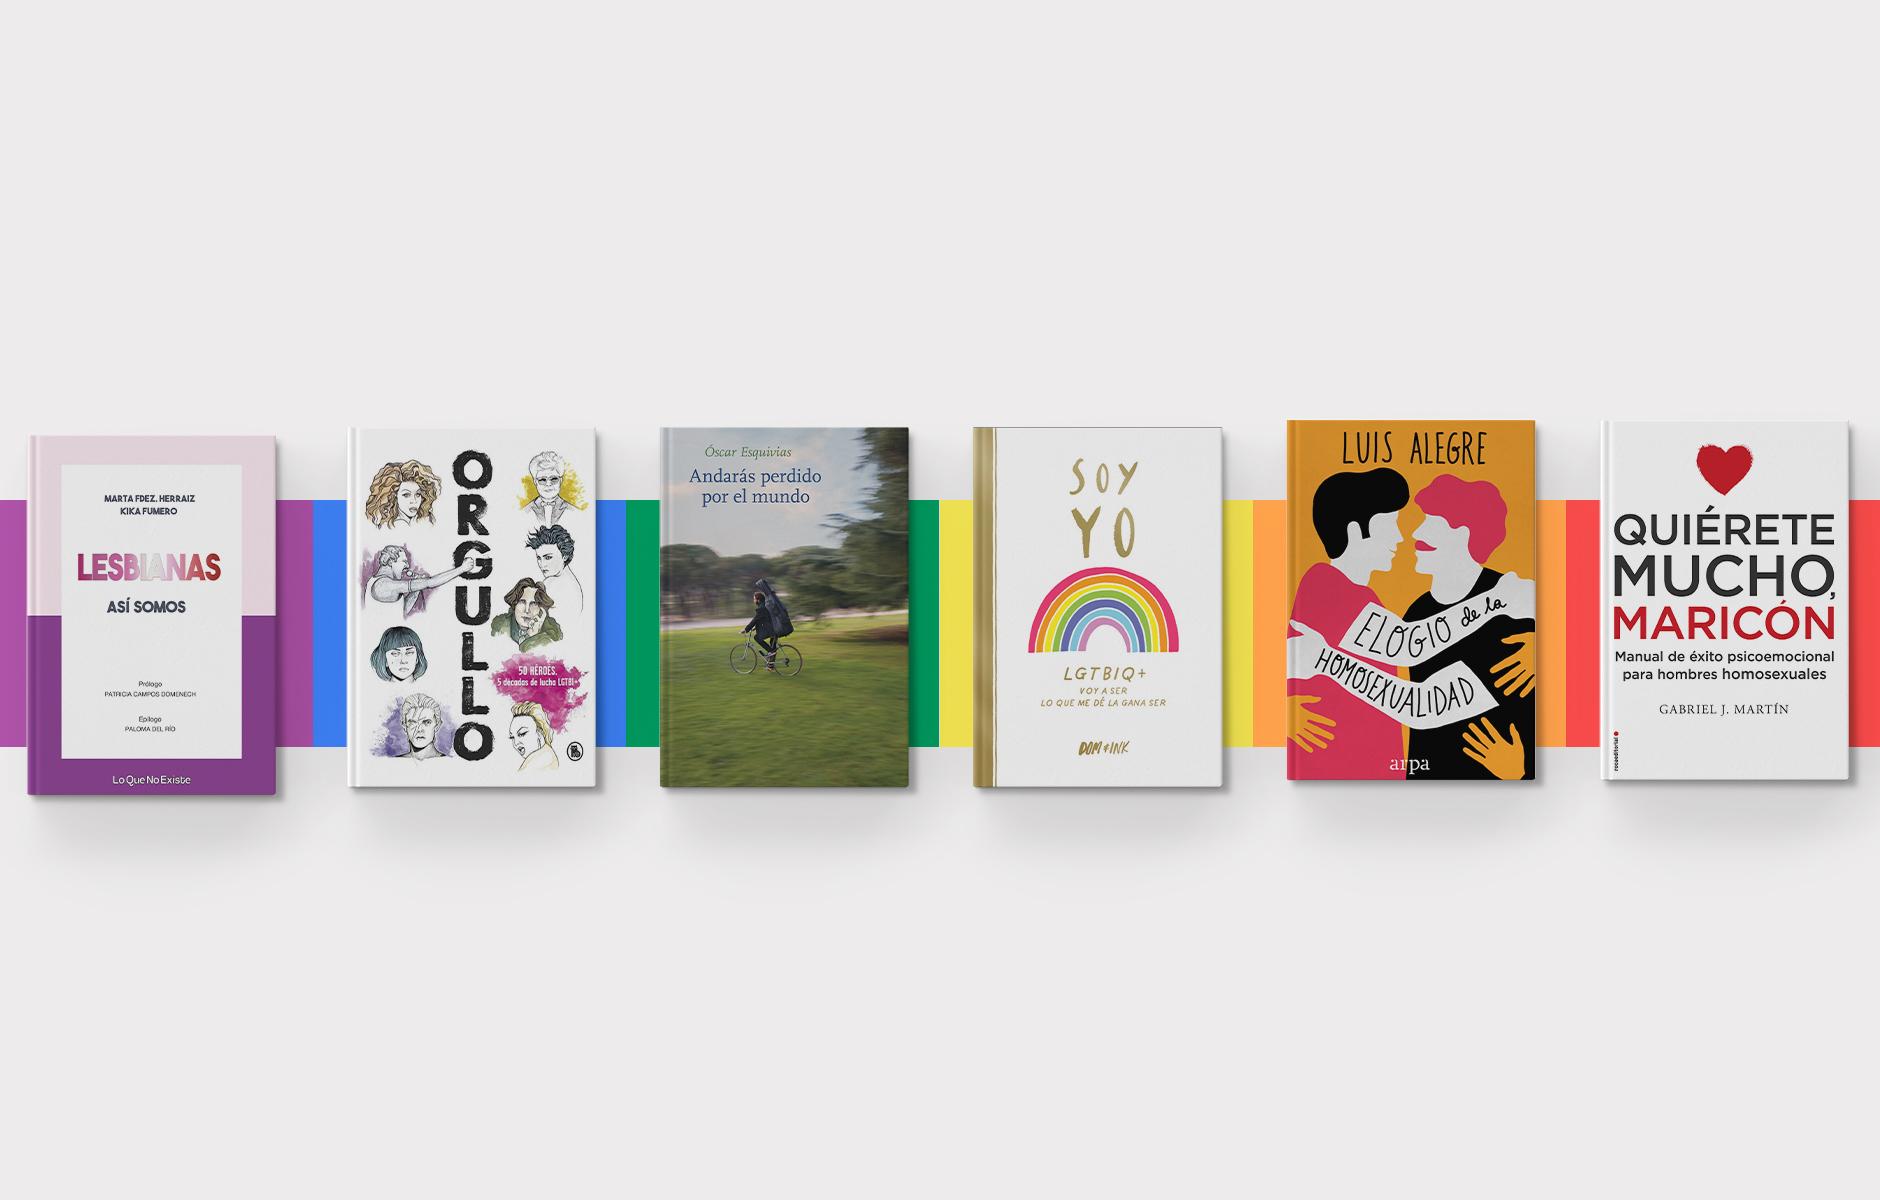 PRINCIPAL-libros-lgtb